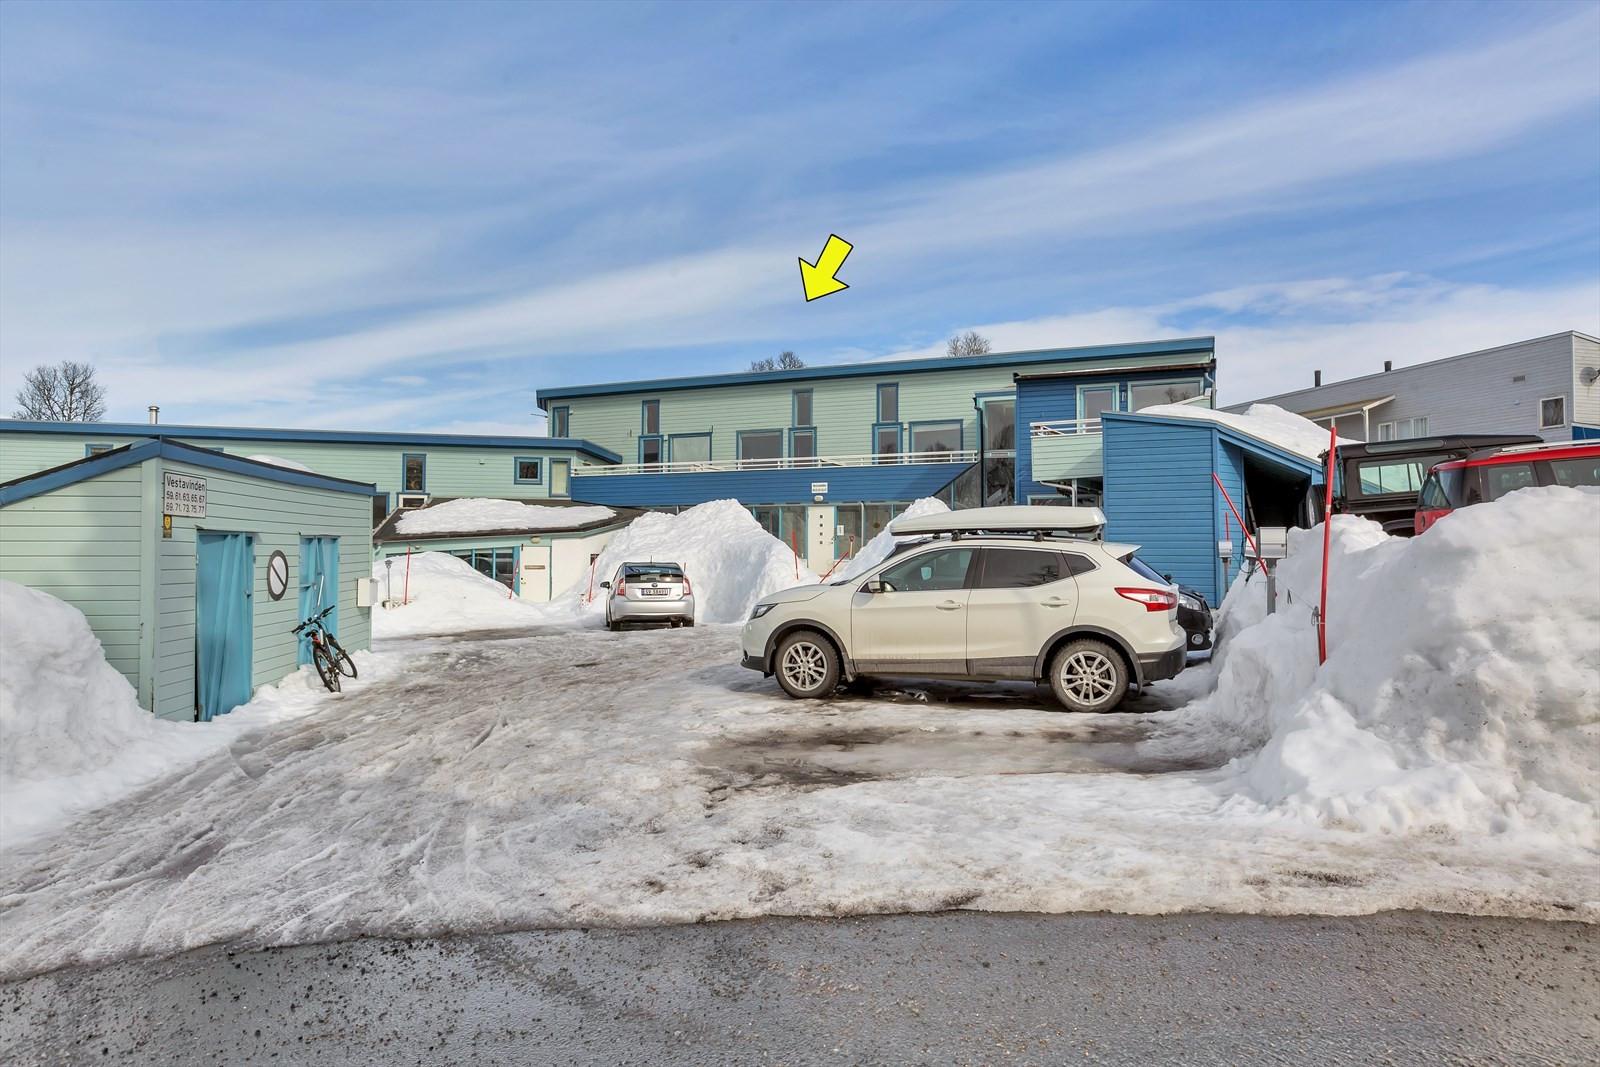 Vestavinden 65 ligger i et meget attraktiv boligområde på vestsiden av Tromsøya